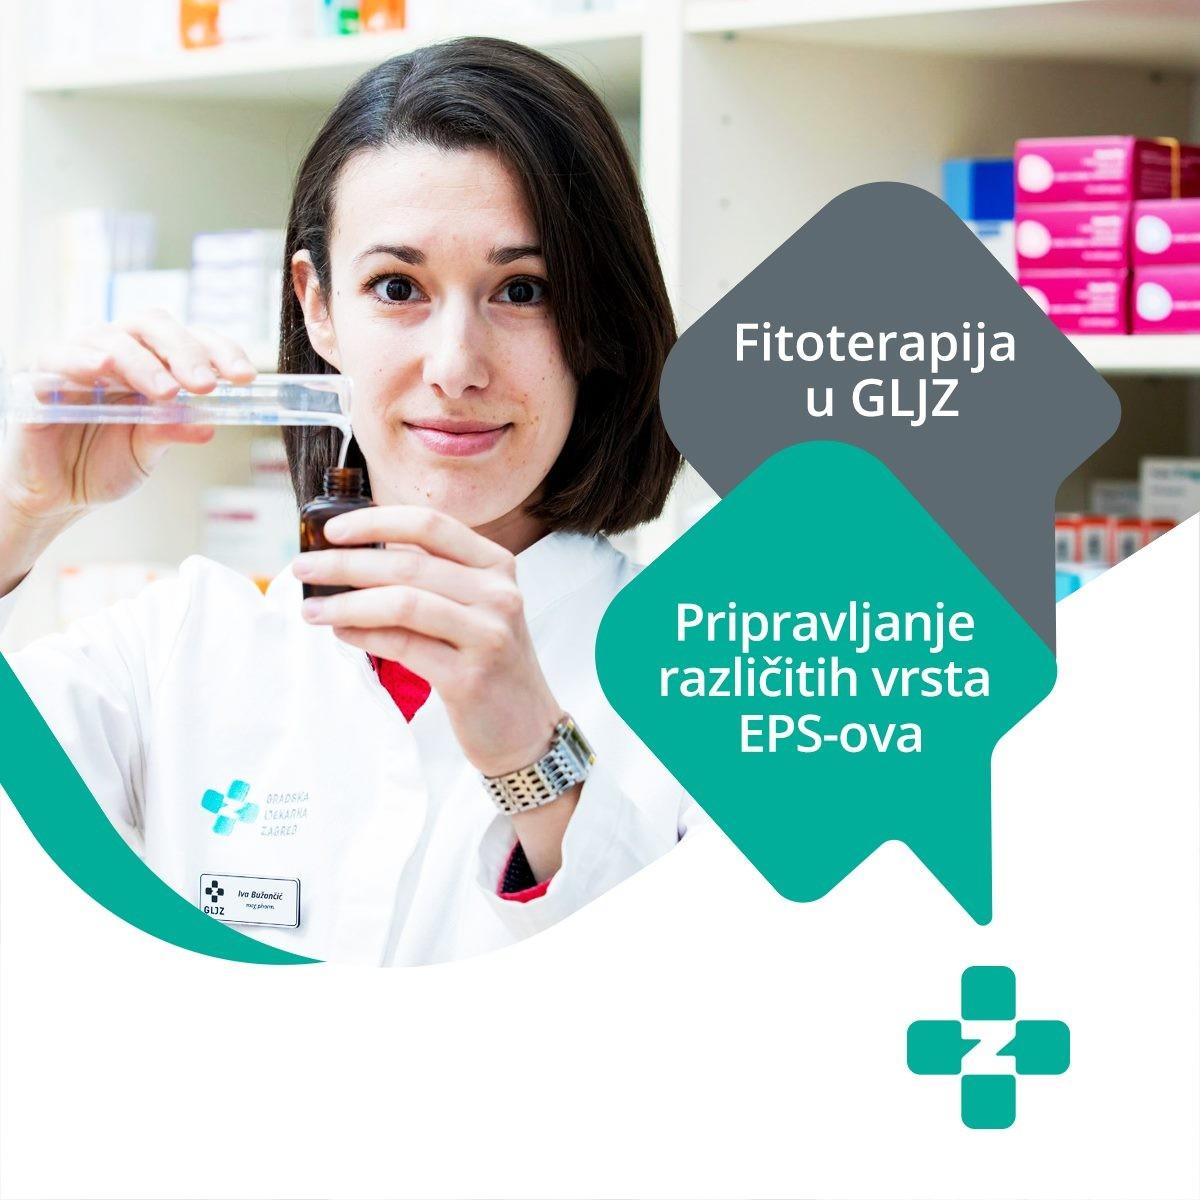 Fitoterapija-u-GLJZ